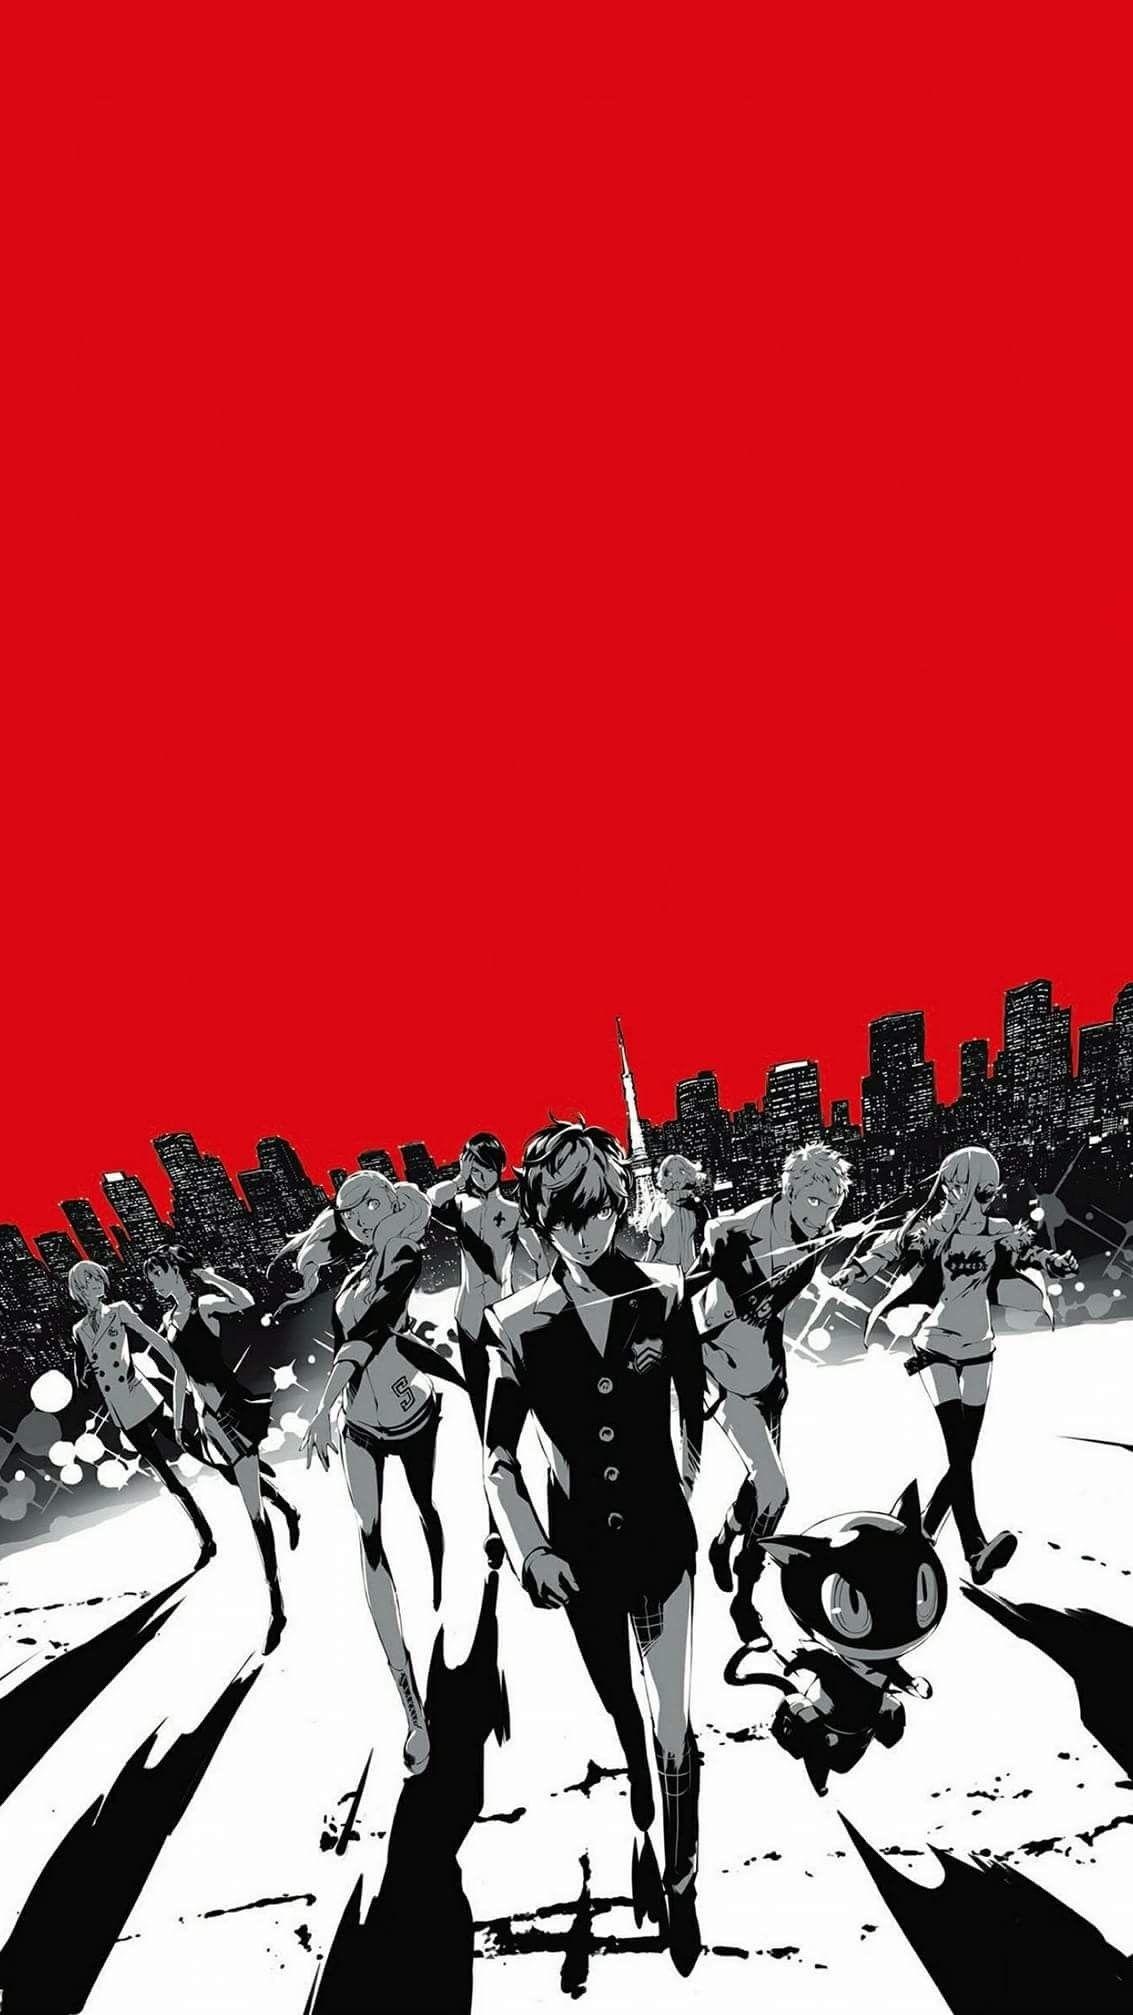 Persona 5 Image jeux video, Dessin manga, Arrière plan